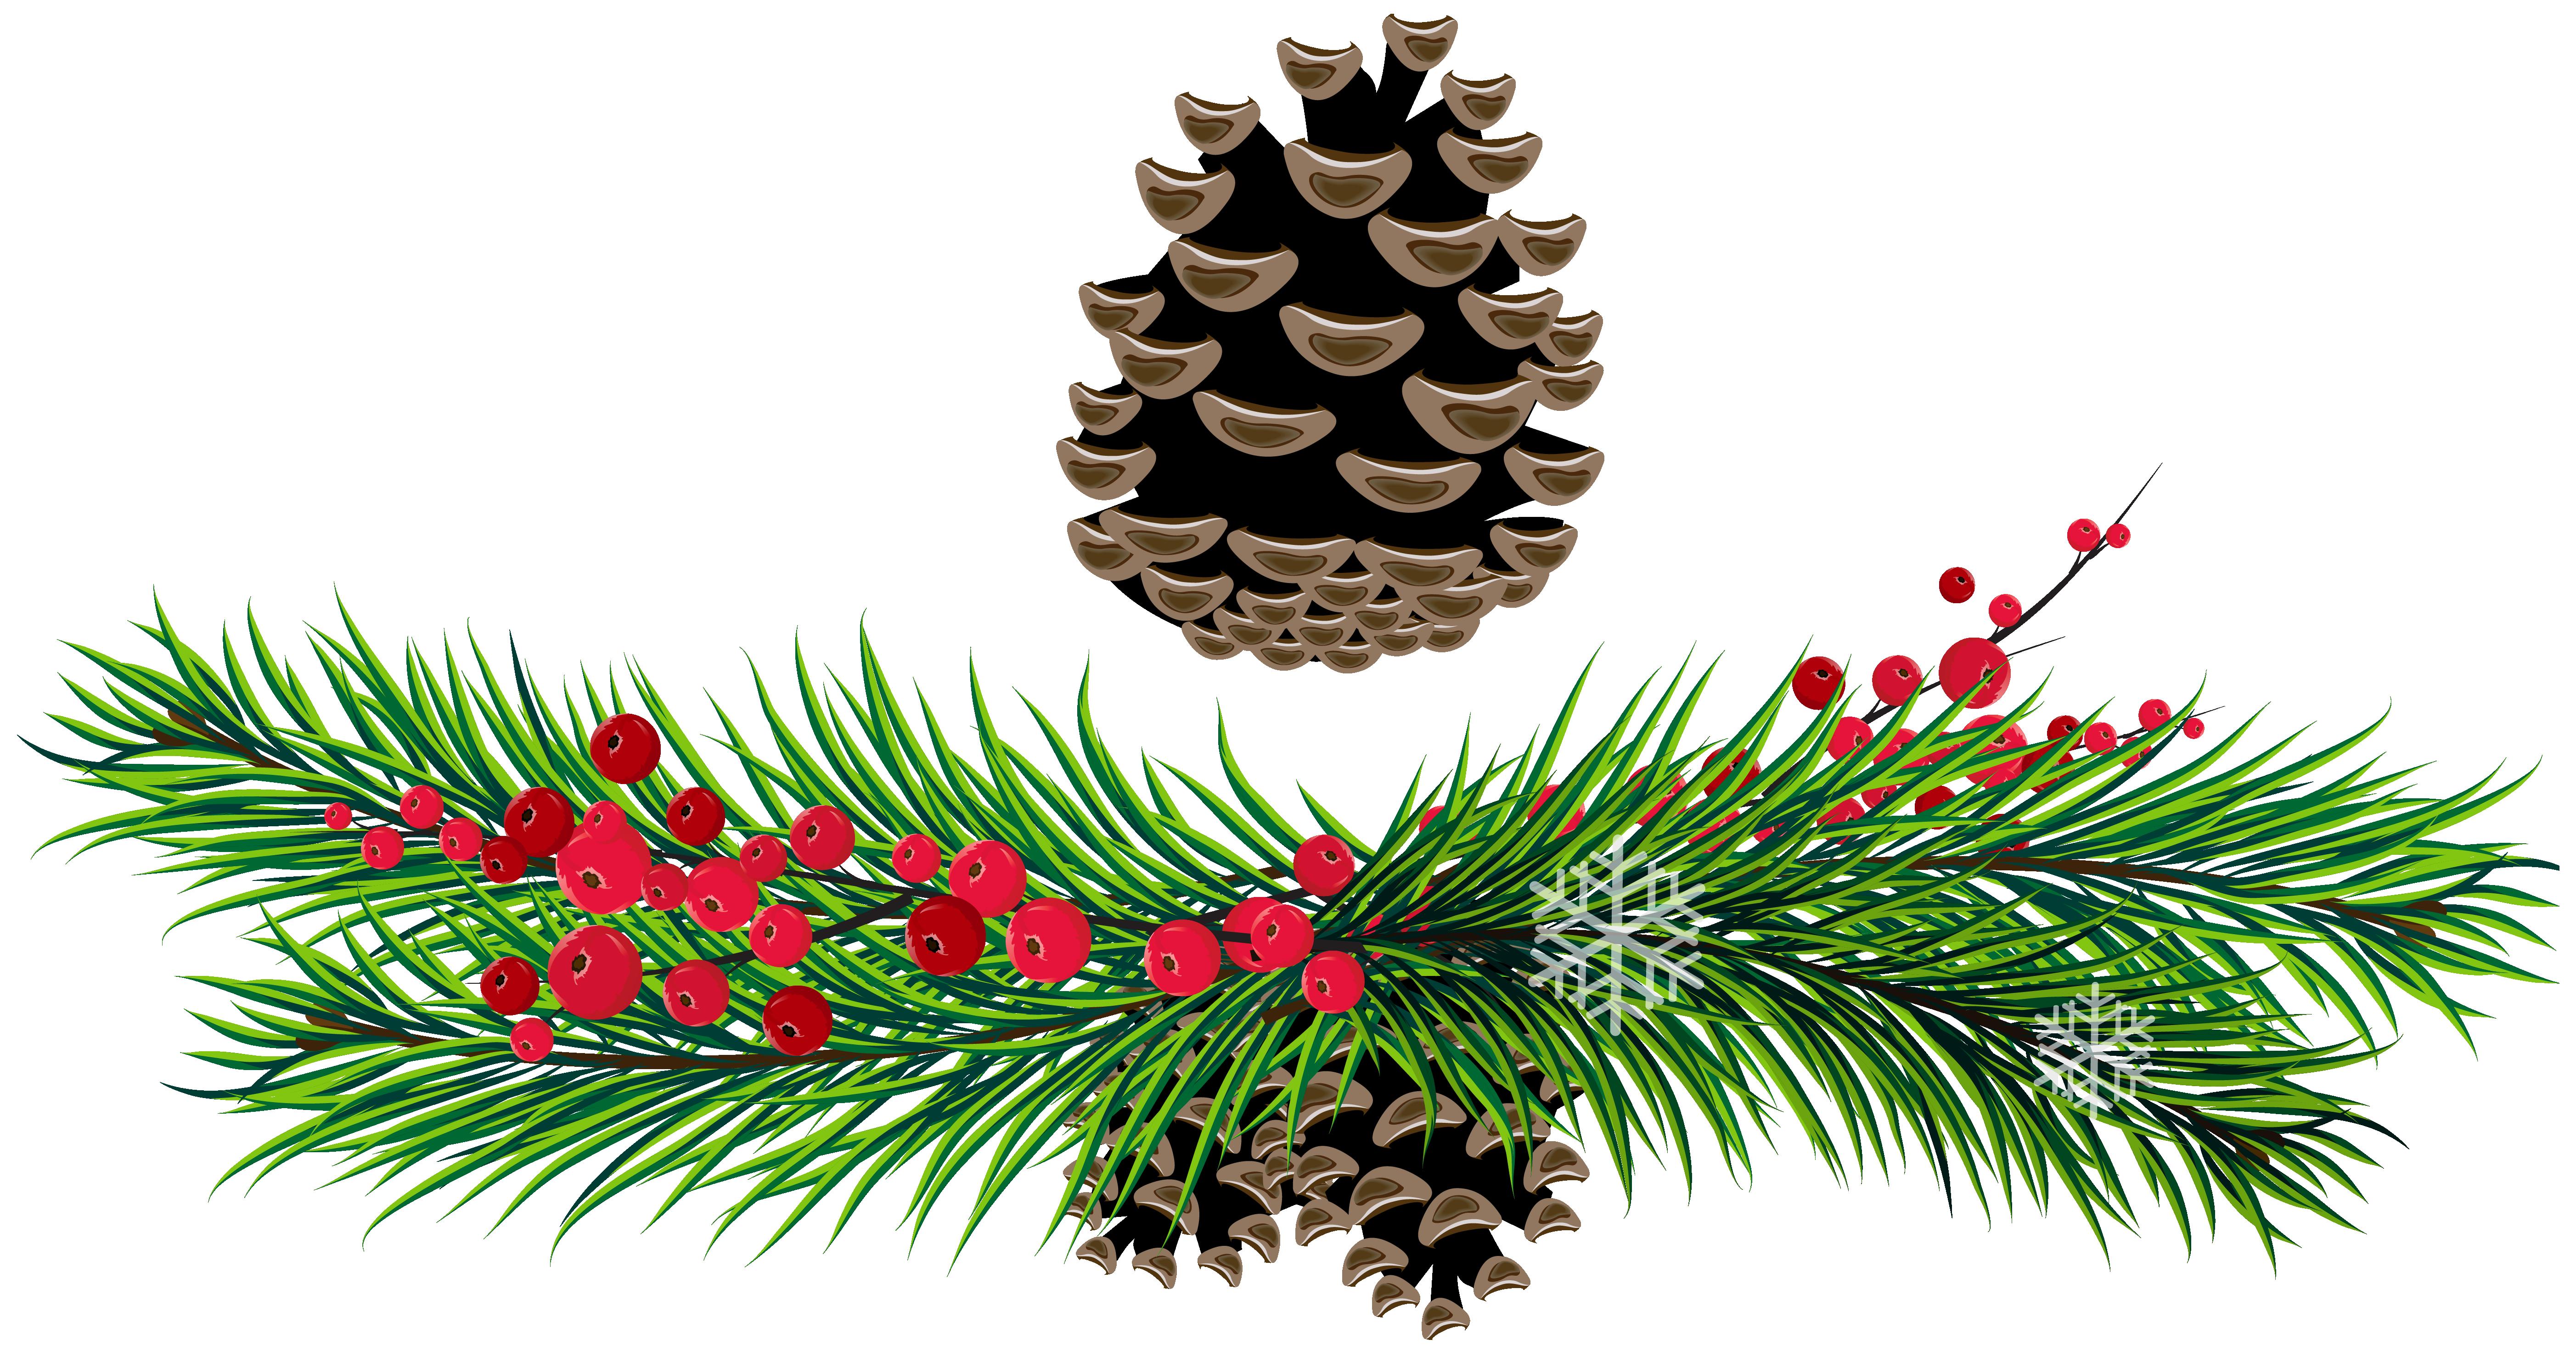 5610x2967 Fir Tree Branches Clip Art Cliparts